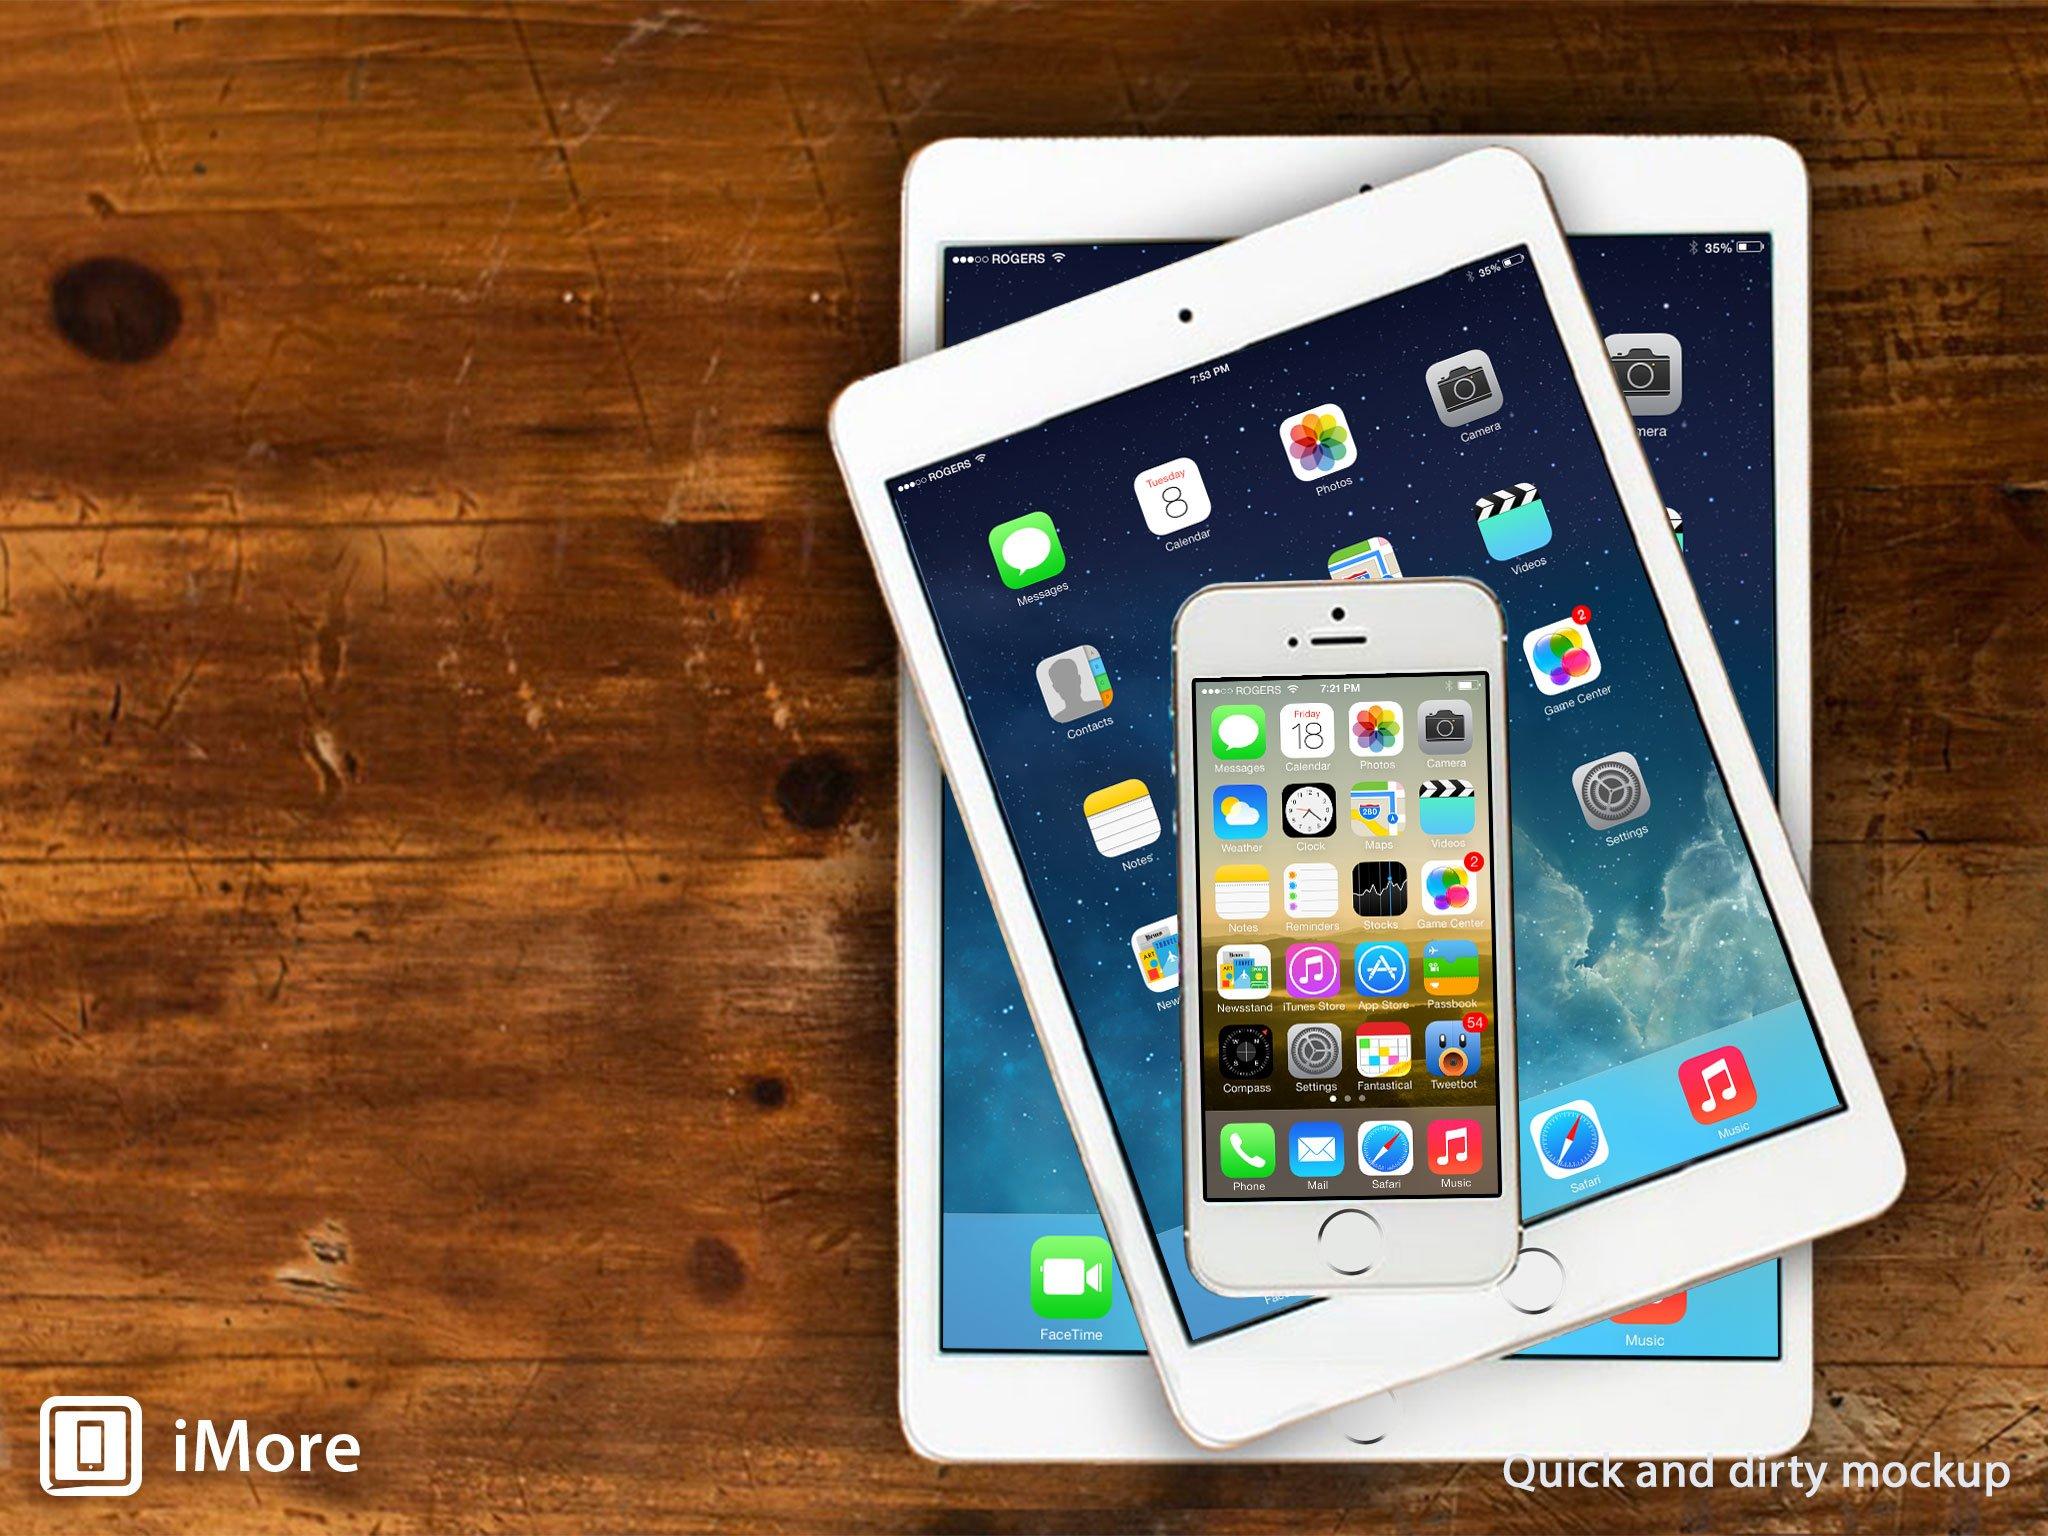 Imagining the iPad 5 and iPad mini 2